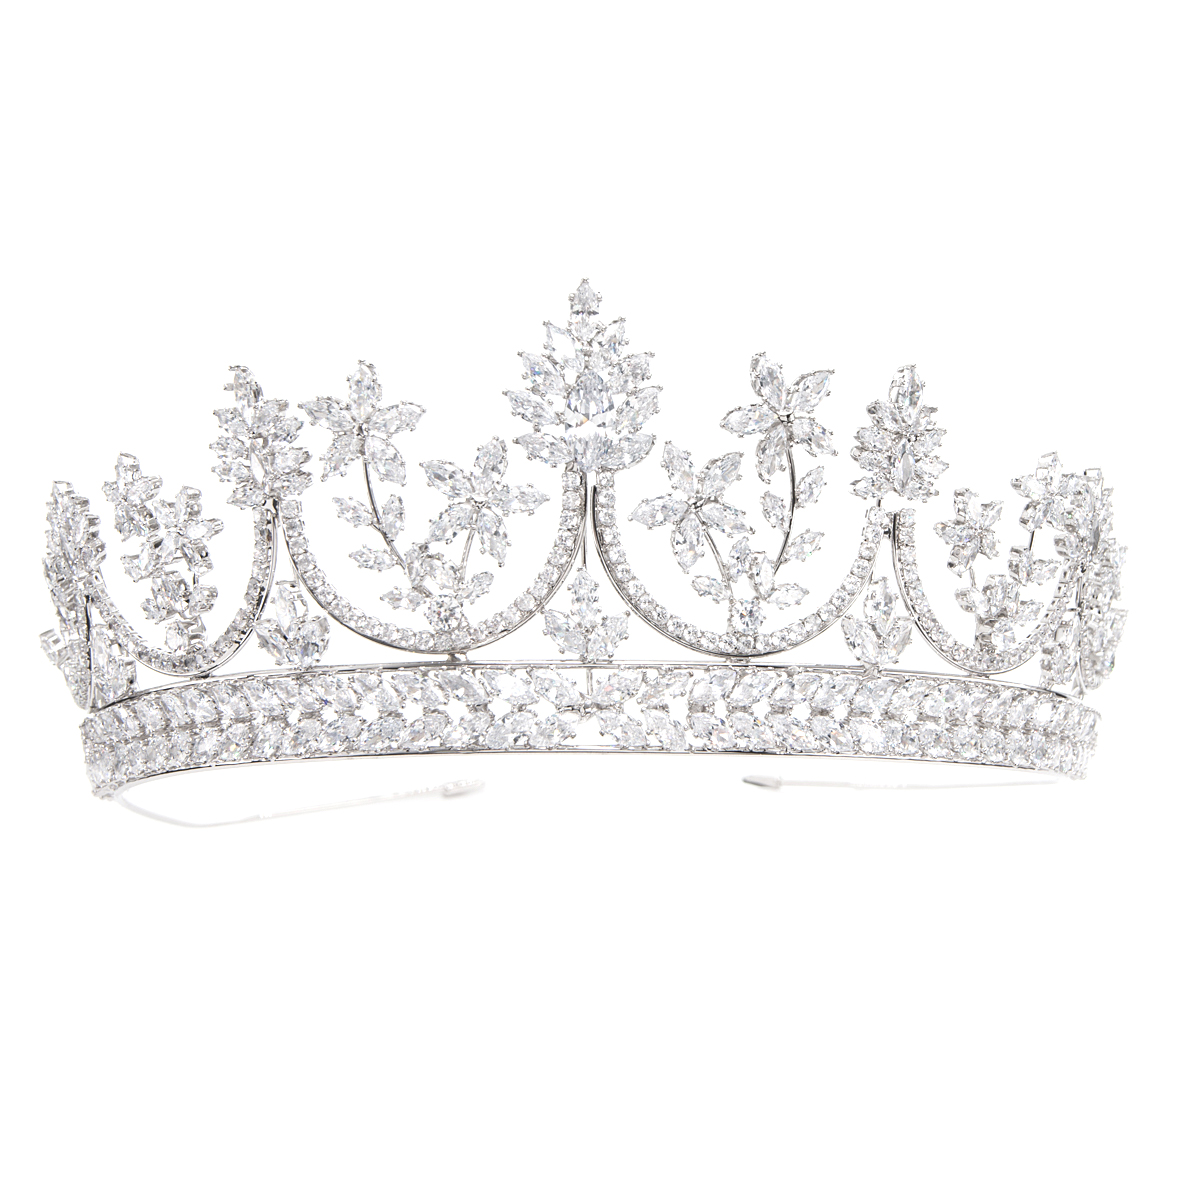 Fashional Crystals Cubic Zirconia Wedding Bridal Princess Royal Tiara Diadem Crown Women Prom Hair Jewelry Accessories